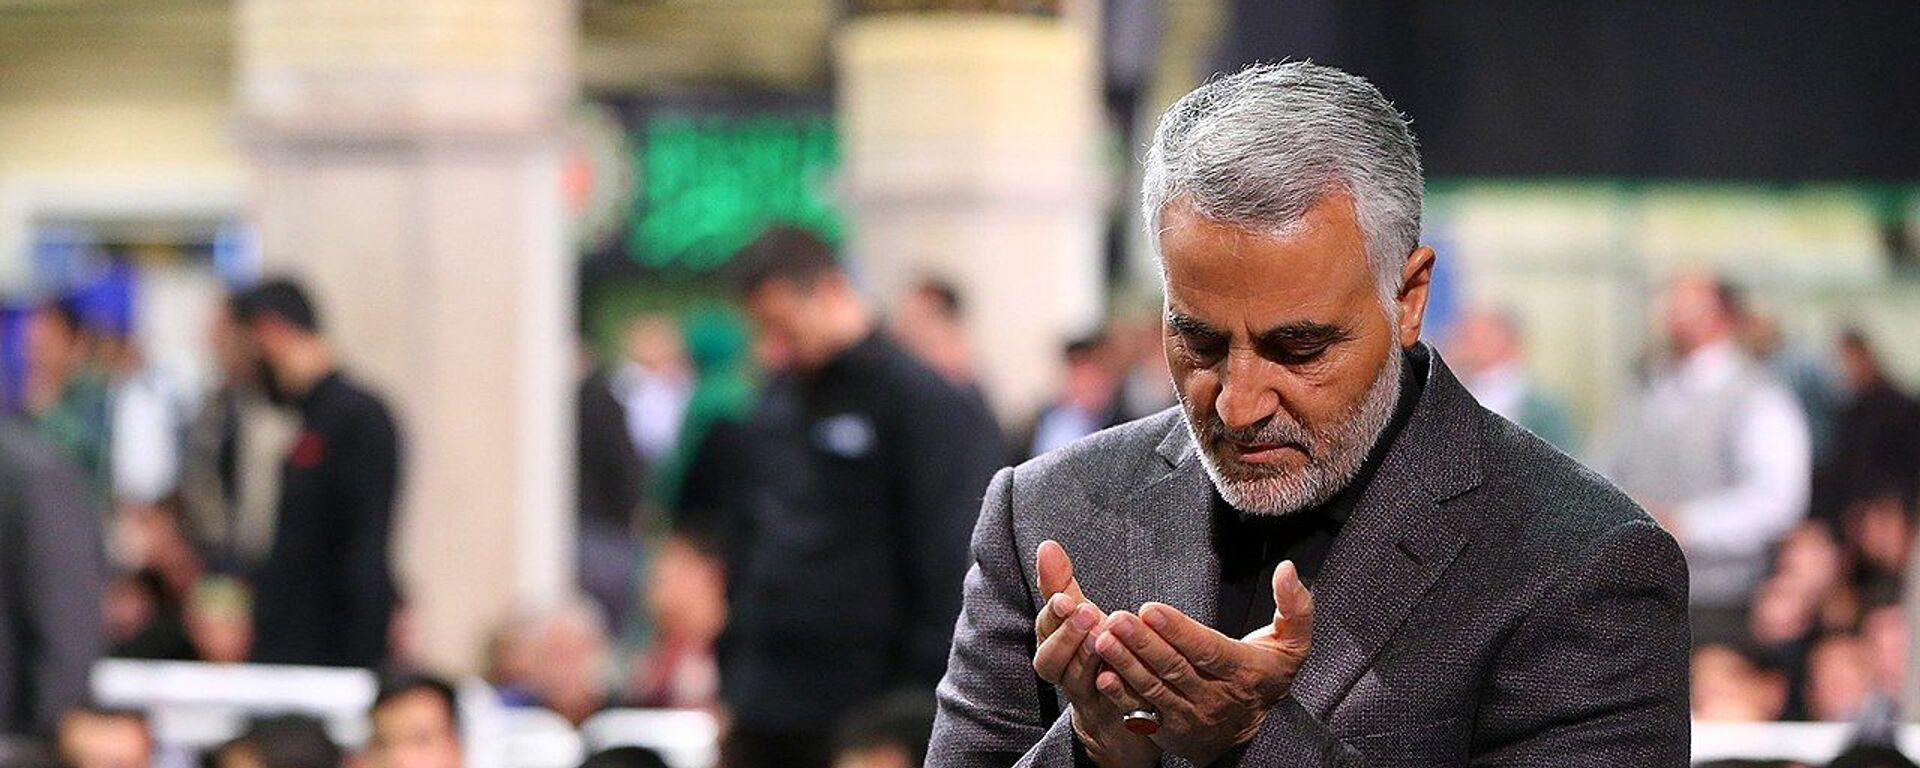 Qasem Soleimani Saying Prayer in Imam Khomeini Hossainiah in Tehran - Sputnik International, 1920, 29.08.2021